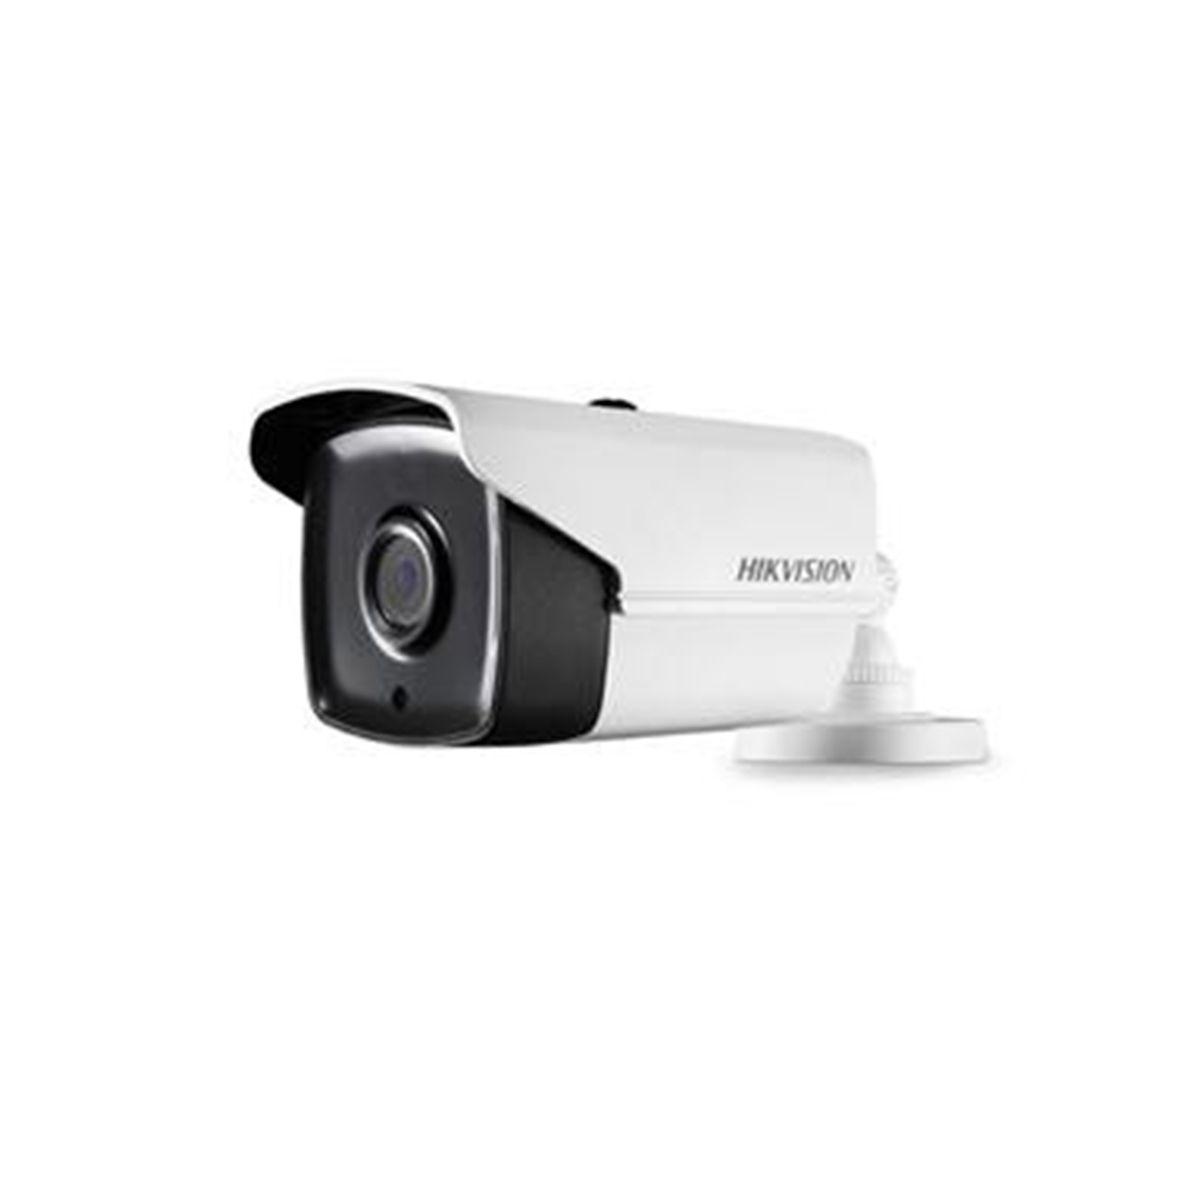 Cámara Hikvision Turbo HD Tipo Bullet DS-2CE16F1T-IT5